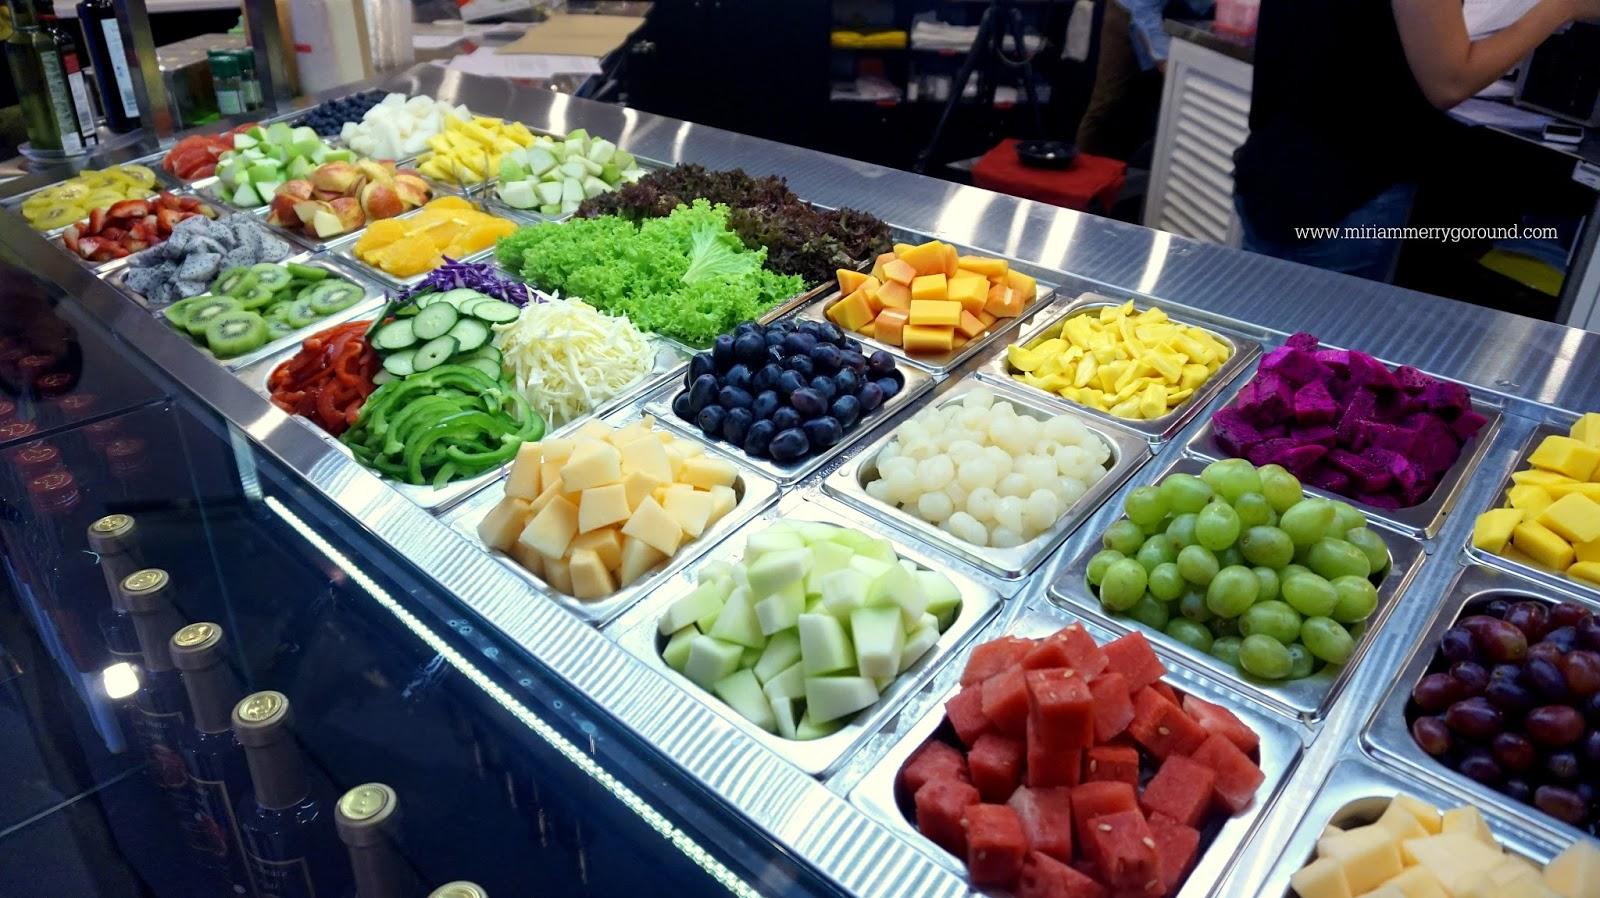 Fruits With MBG New Salad Bar